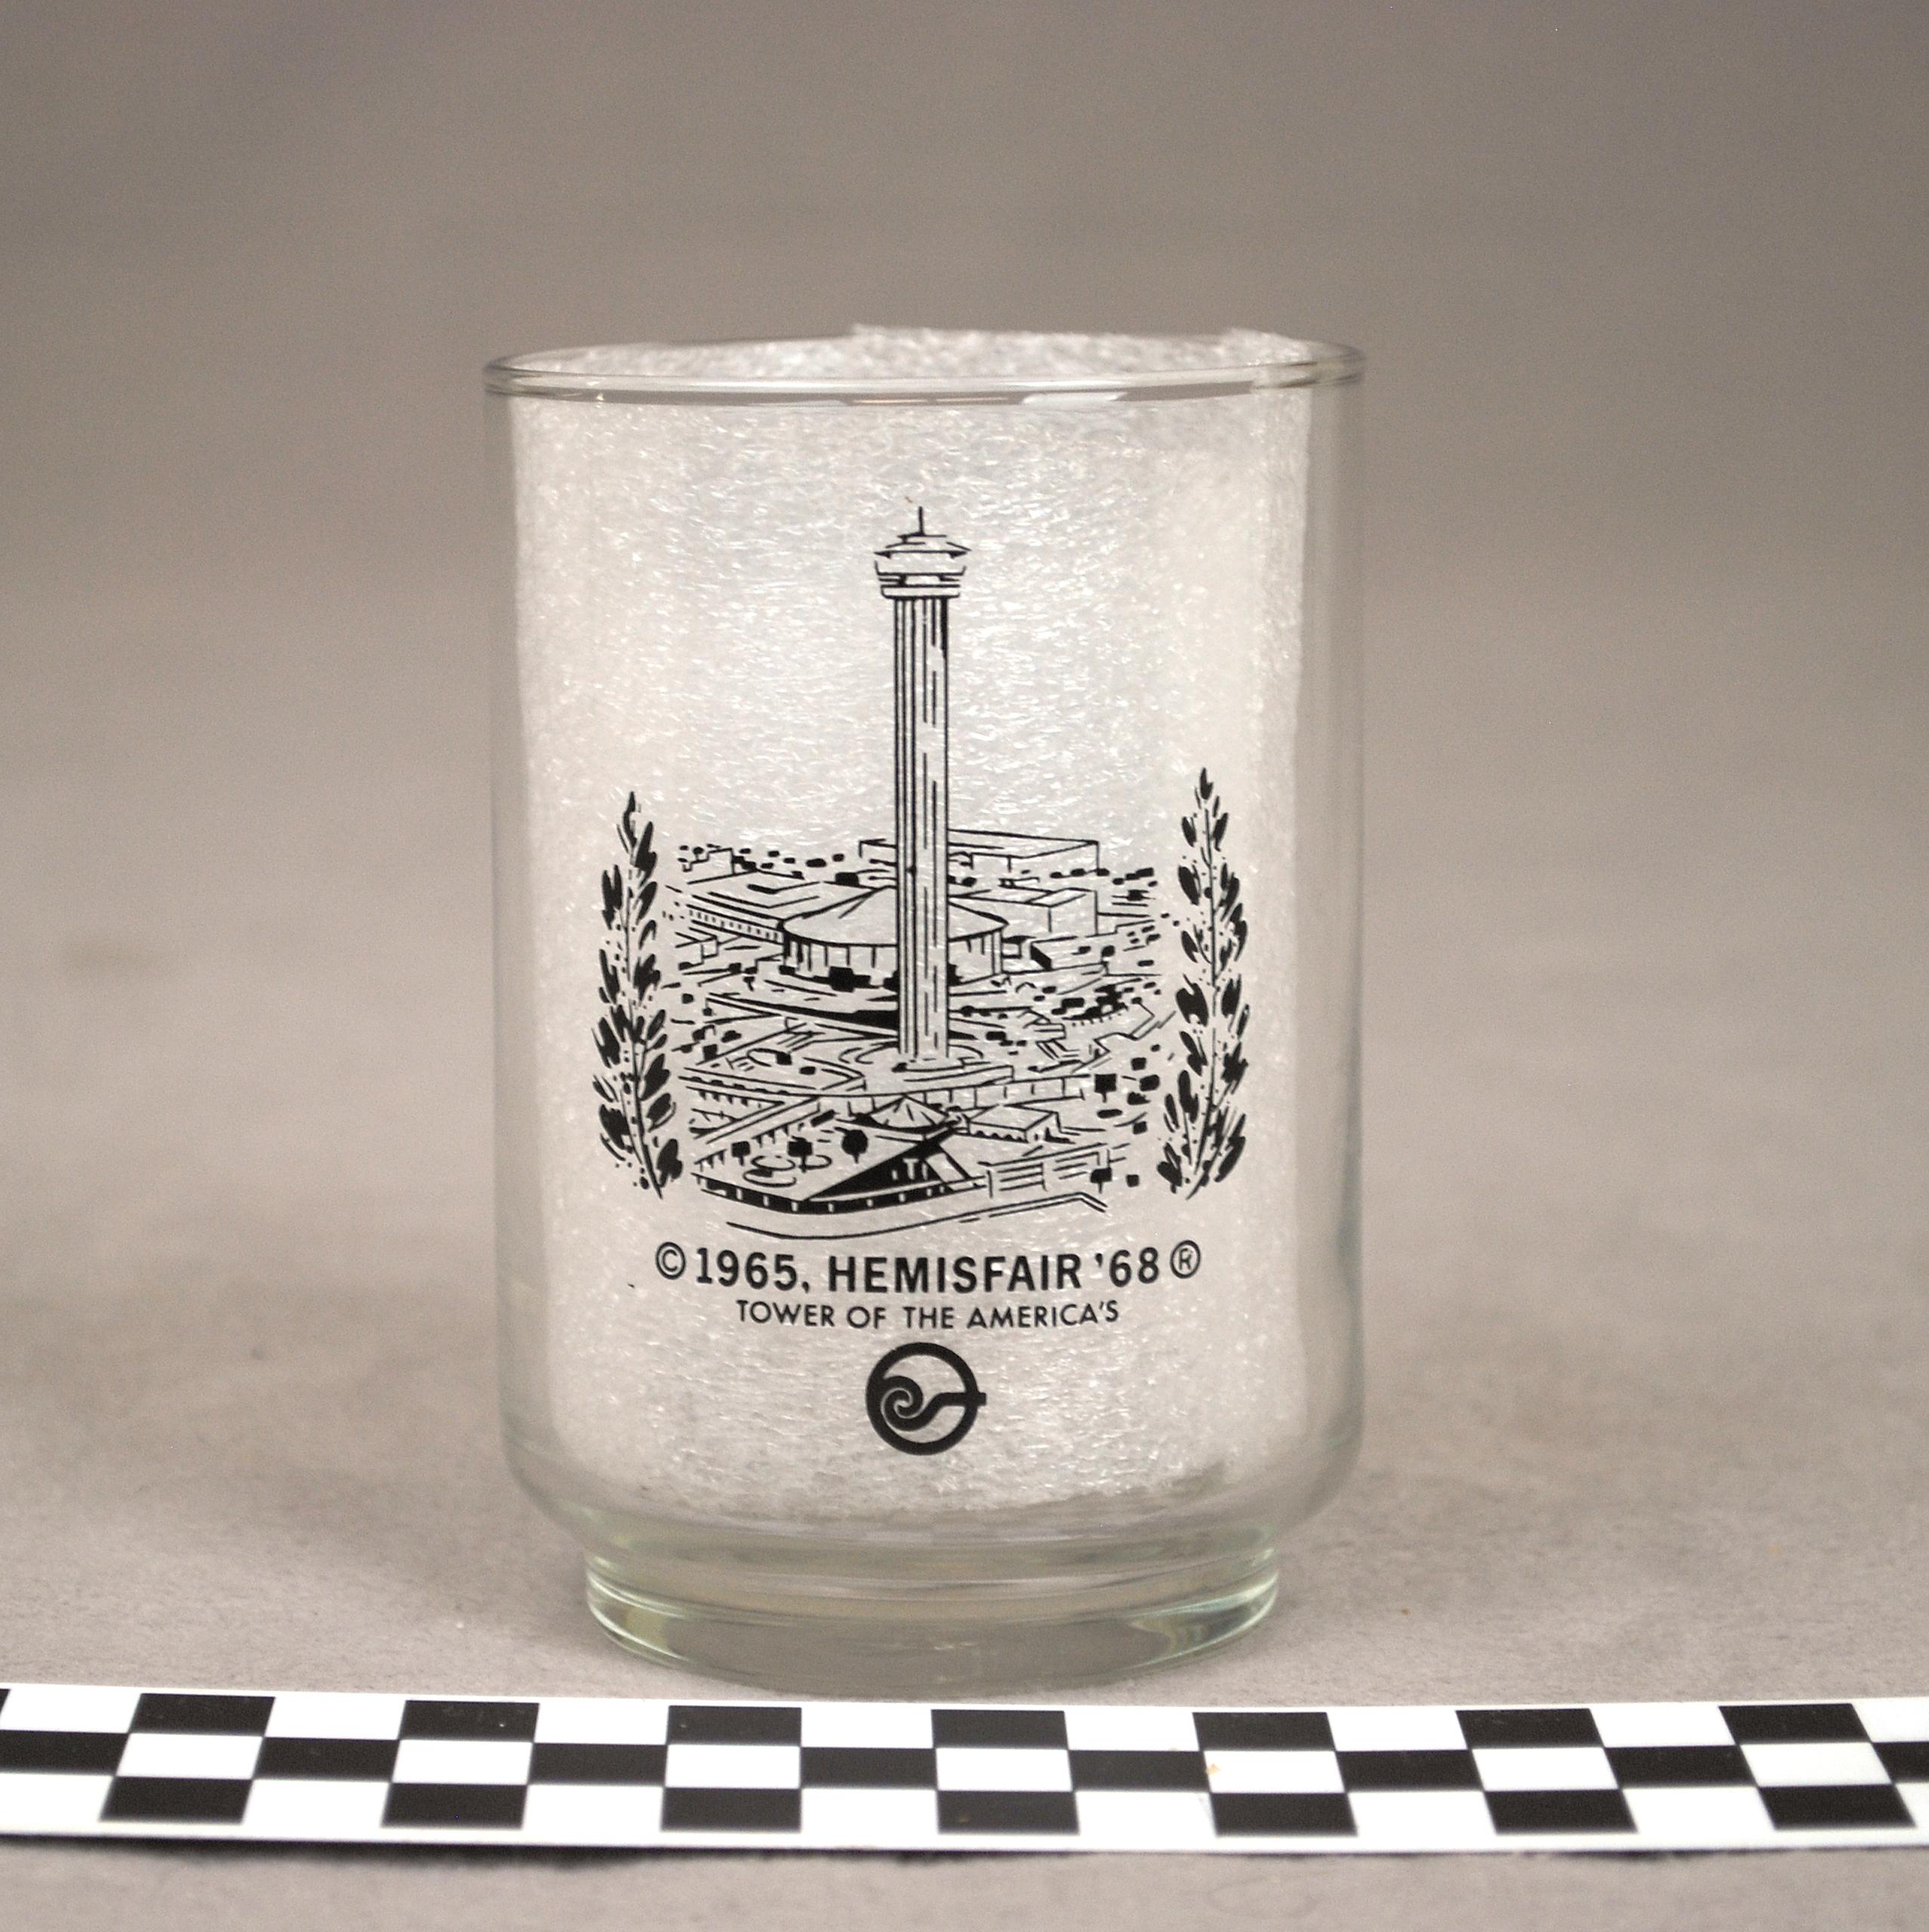 Object: Cup (HemisFair '68 souvenir cup)   UTSA Institute Of Texan Cultures